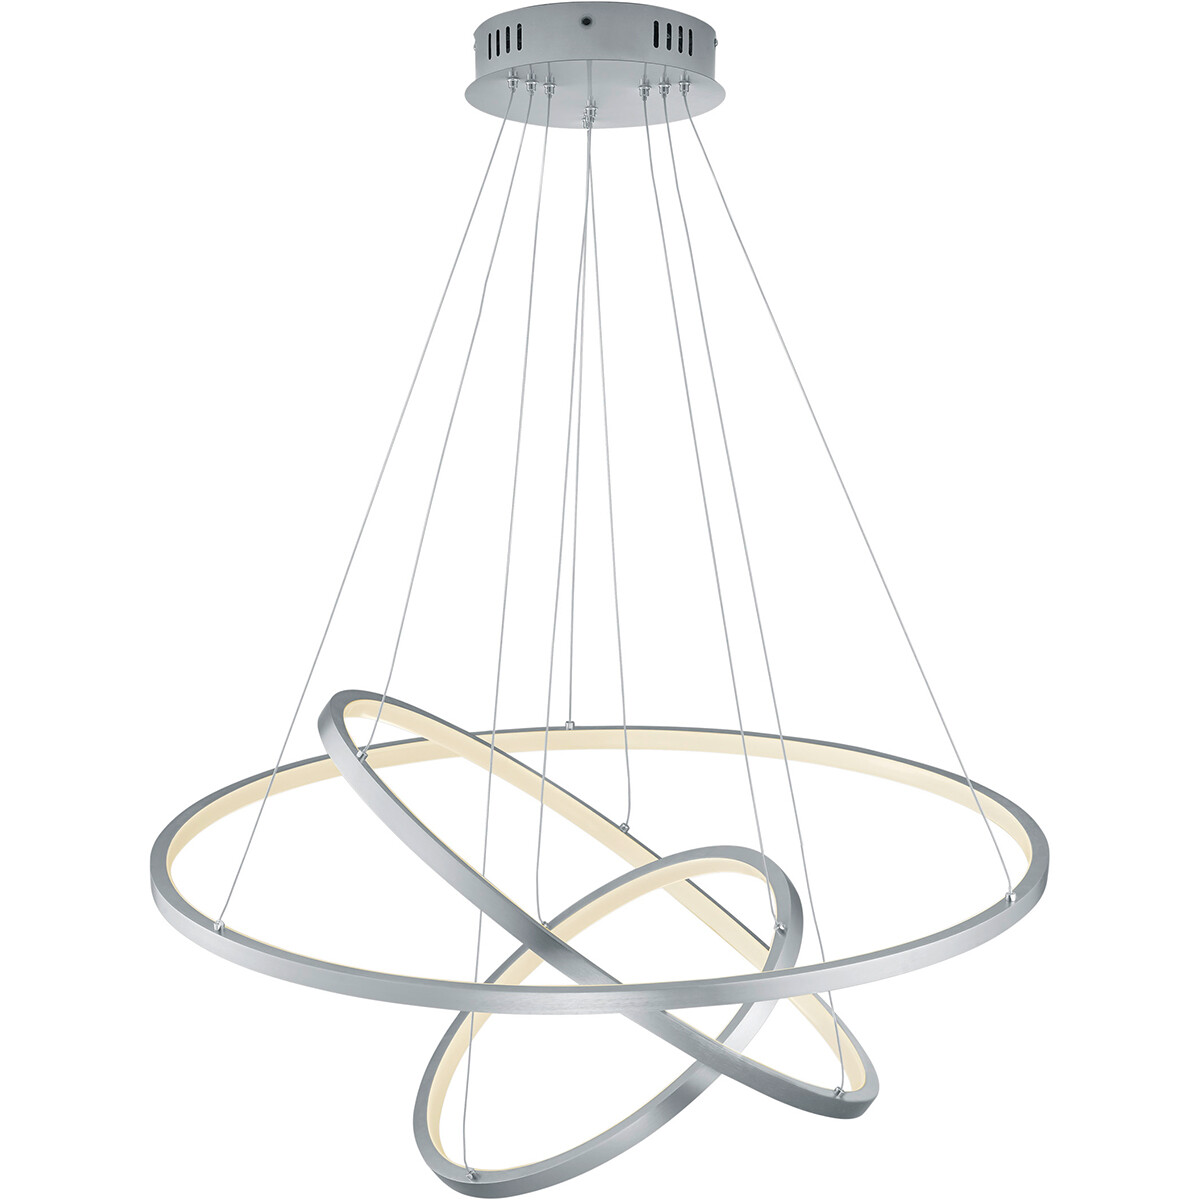 LED Hanglamp WiZ - Smart LED - Hangverlichting - Trion Noraan - 80W - Aanpasbare Kleur - RGBW - Rond